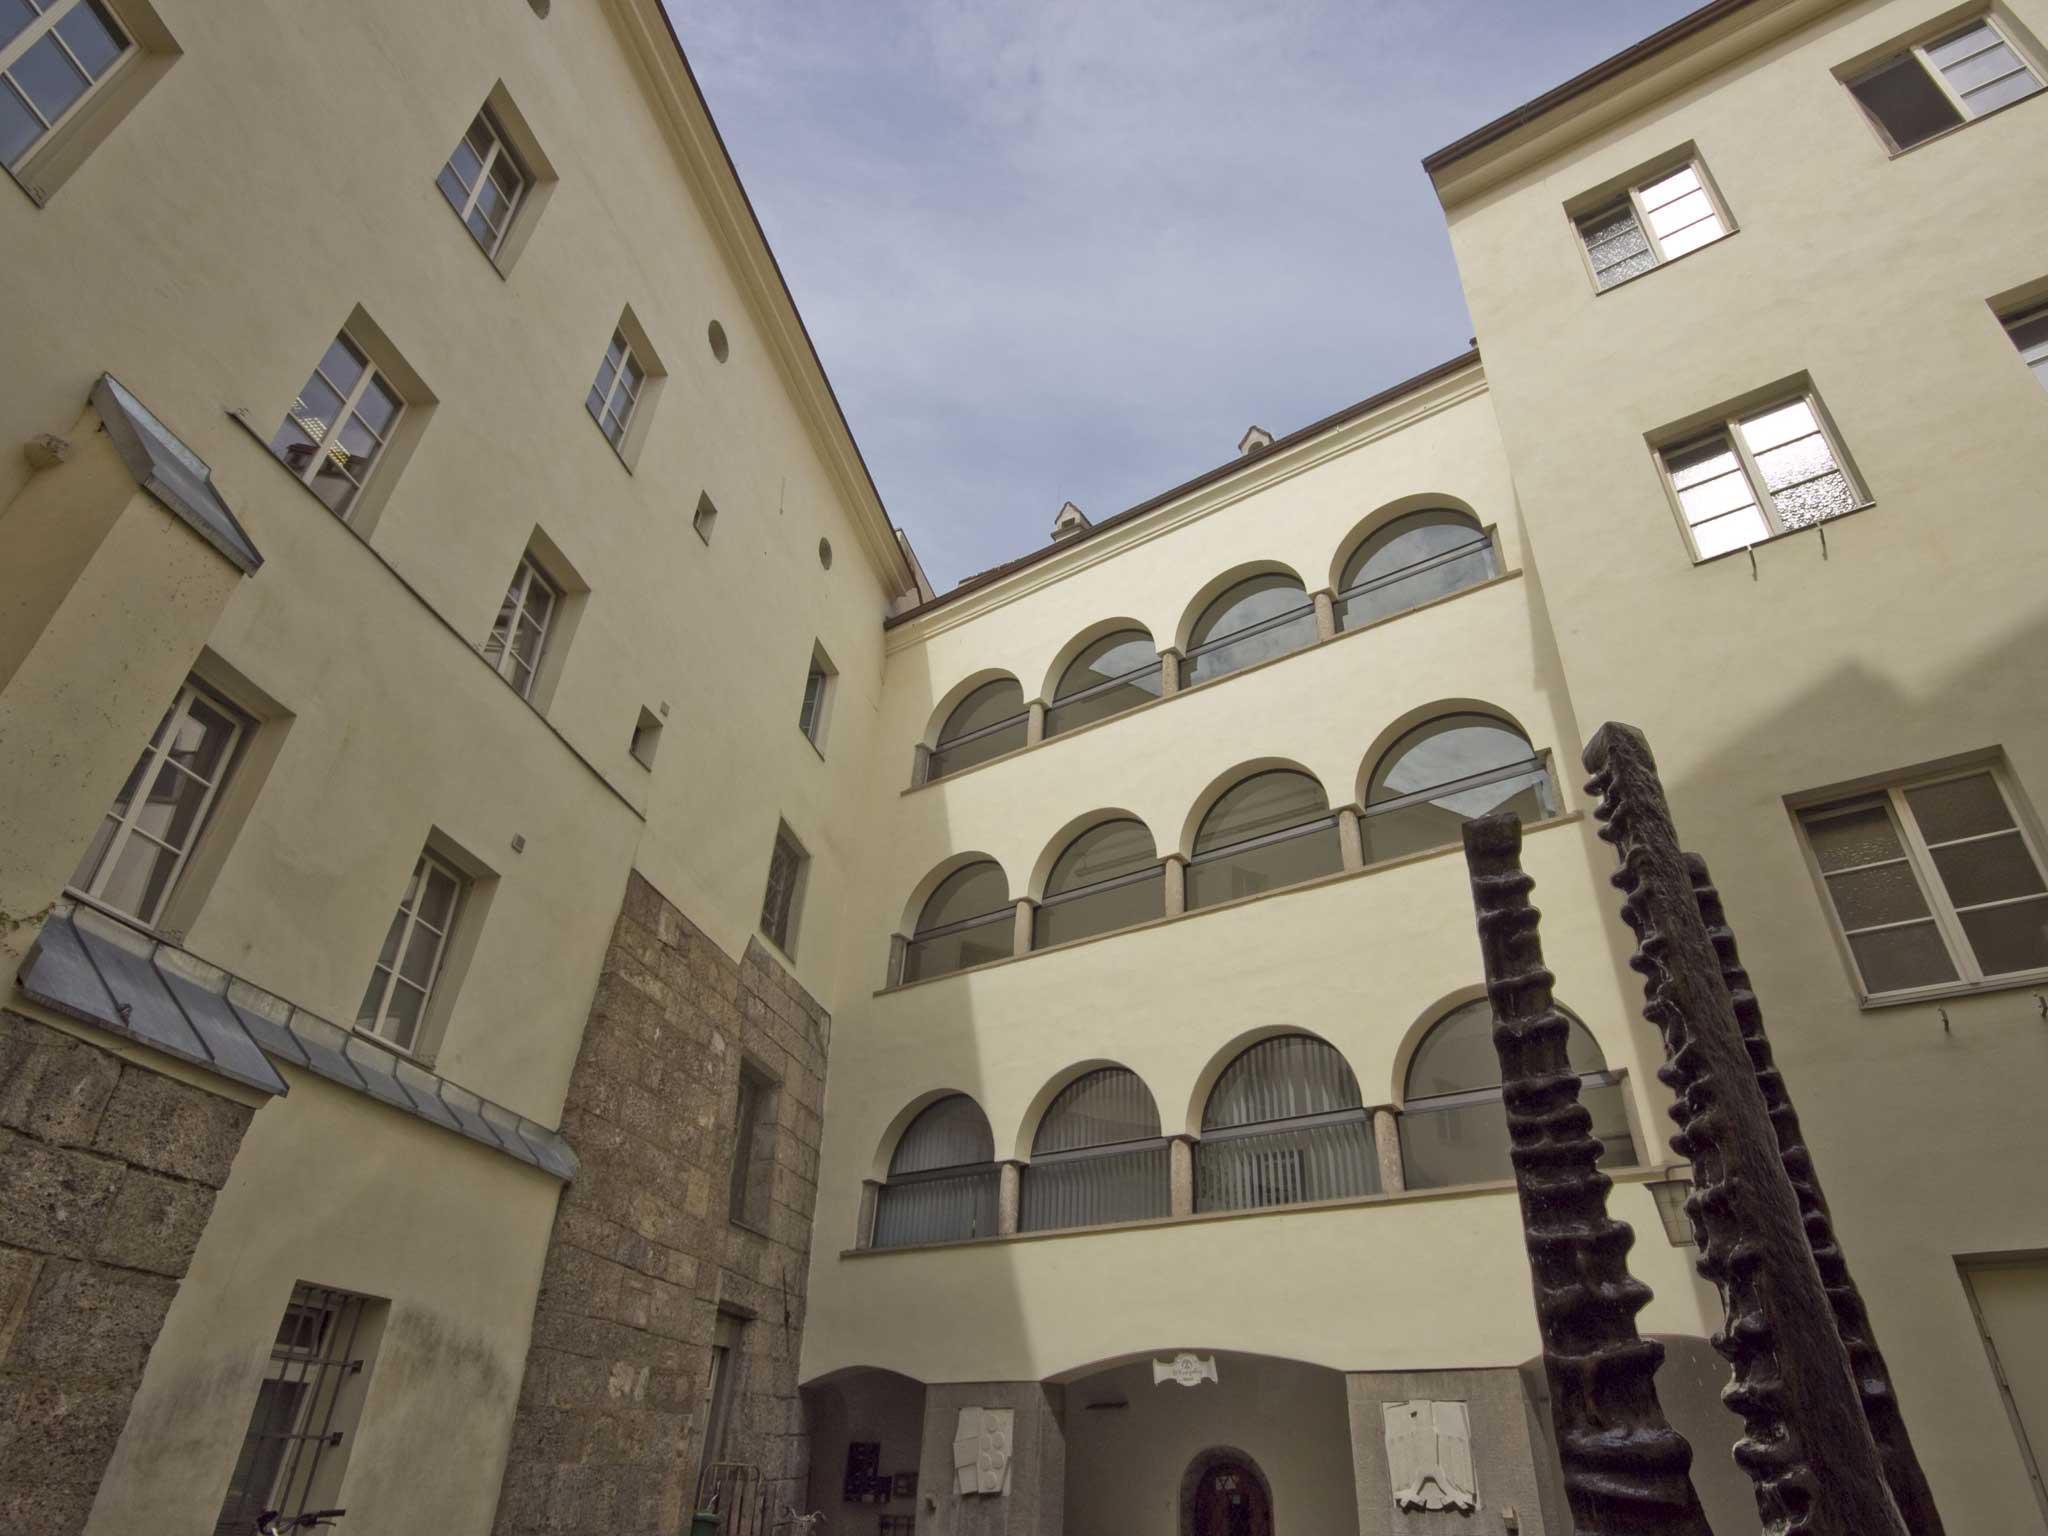 Pop-Up Altstadtkonzert: Innsbrucker Bläserensemble